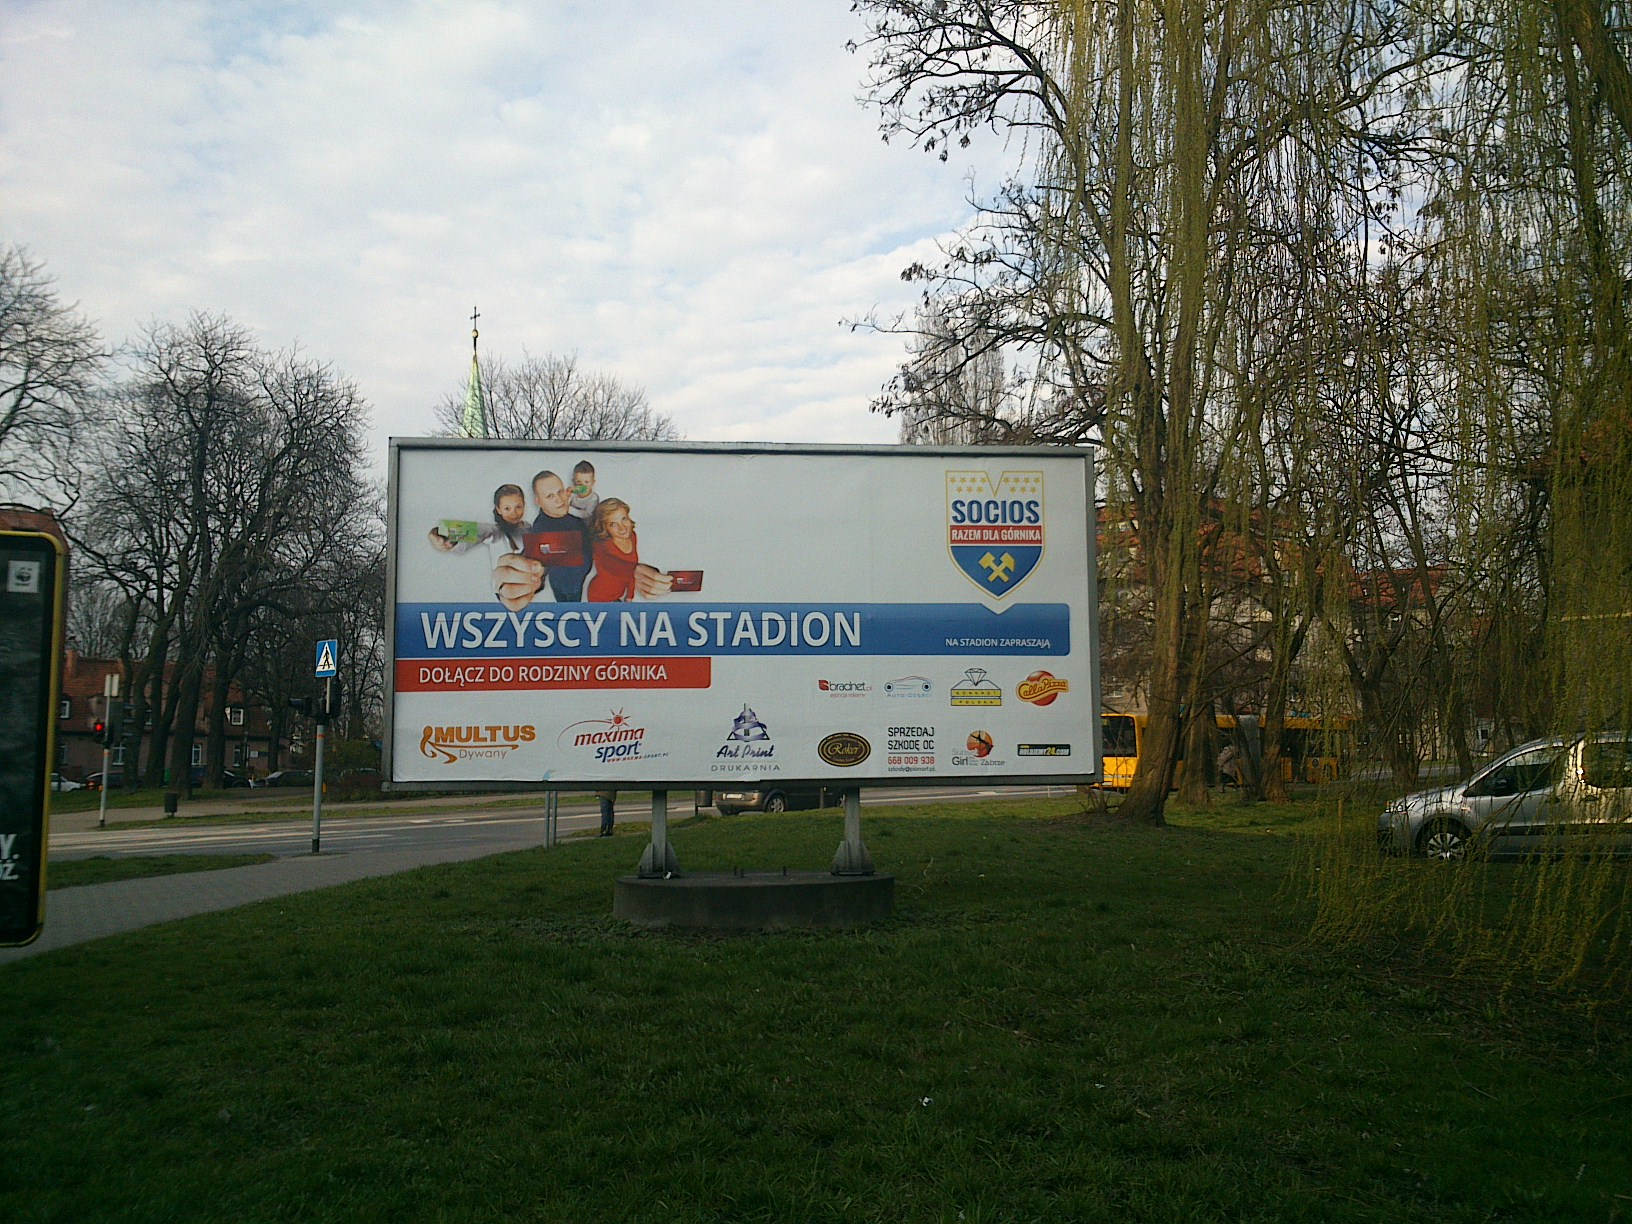 Wielka Kampania Socios Górnik Socios